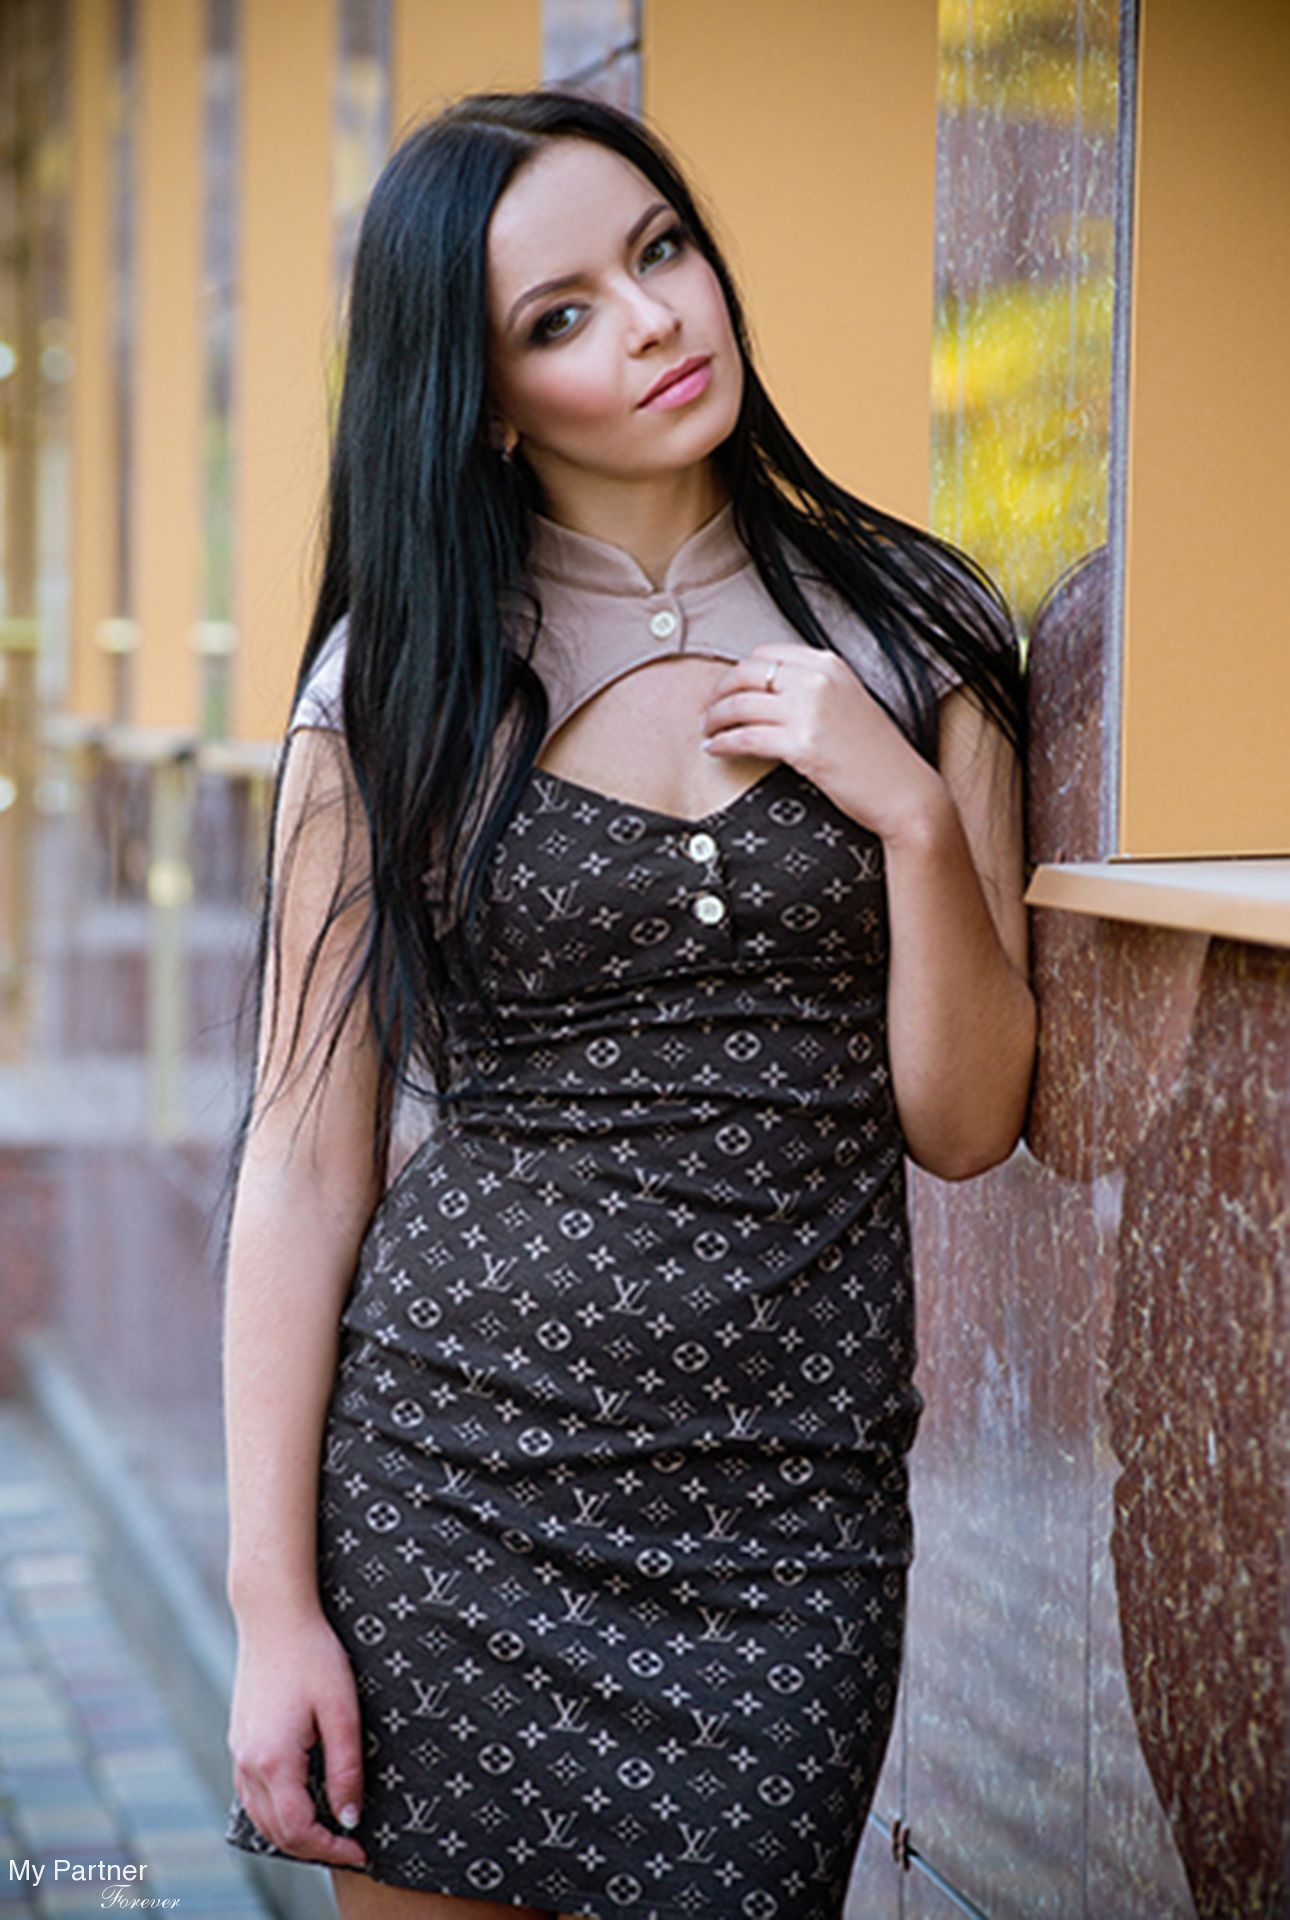 Charming Bride from Ukraine - Karina from Zaporozhye, Ukraine